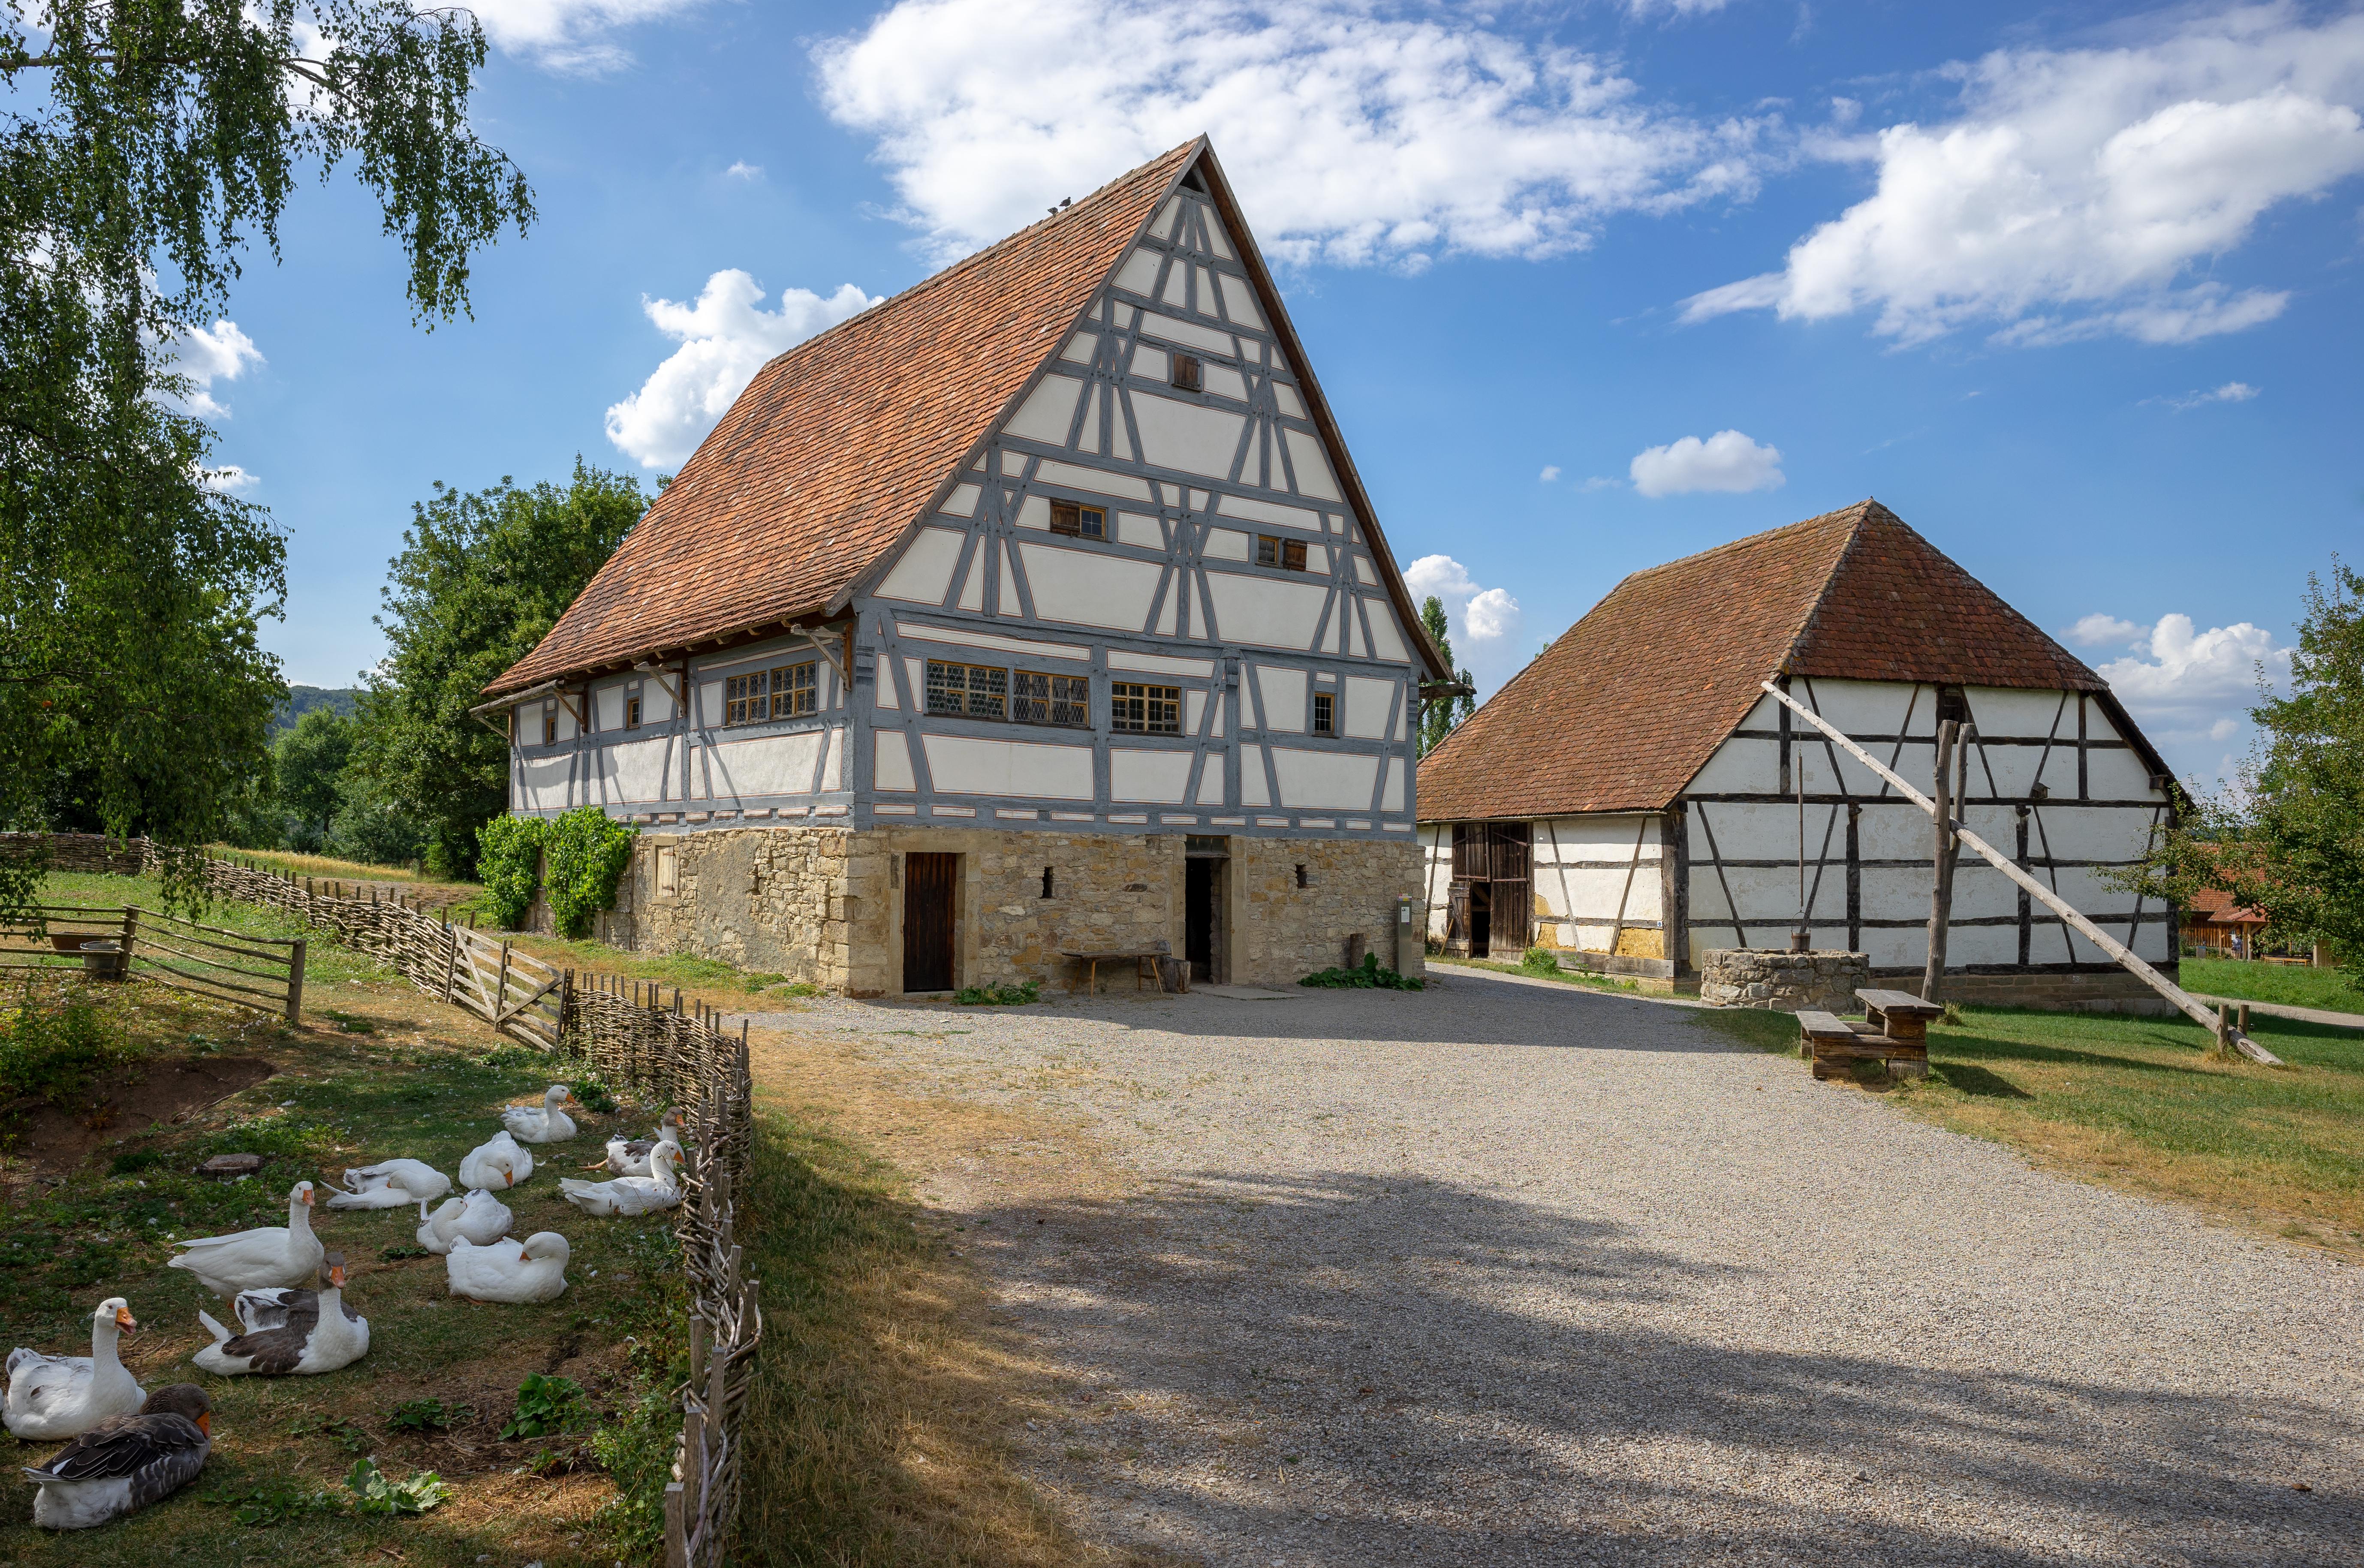 Datei Hohenloher Freilandmuseum Baugruppe Hohenloher Dorf Haus